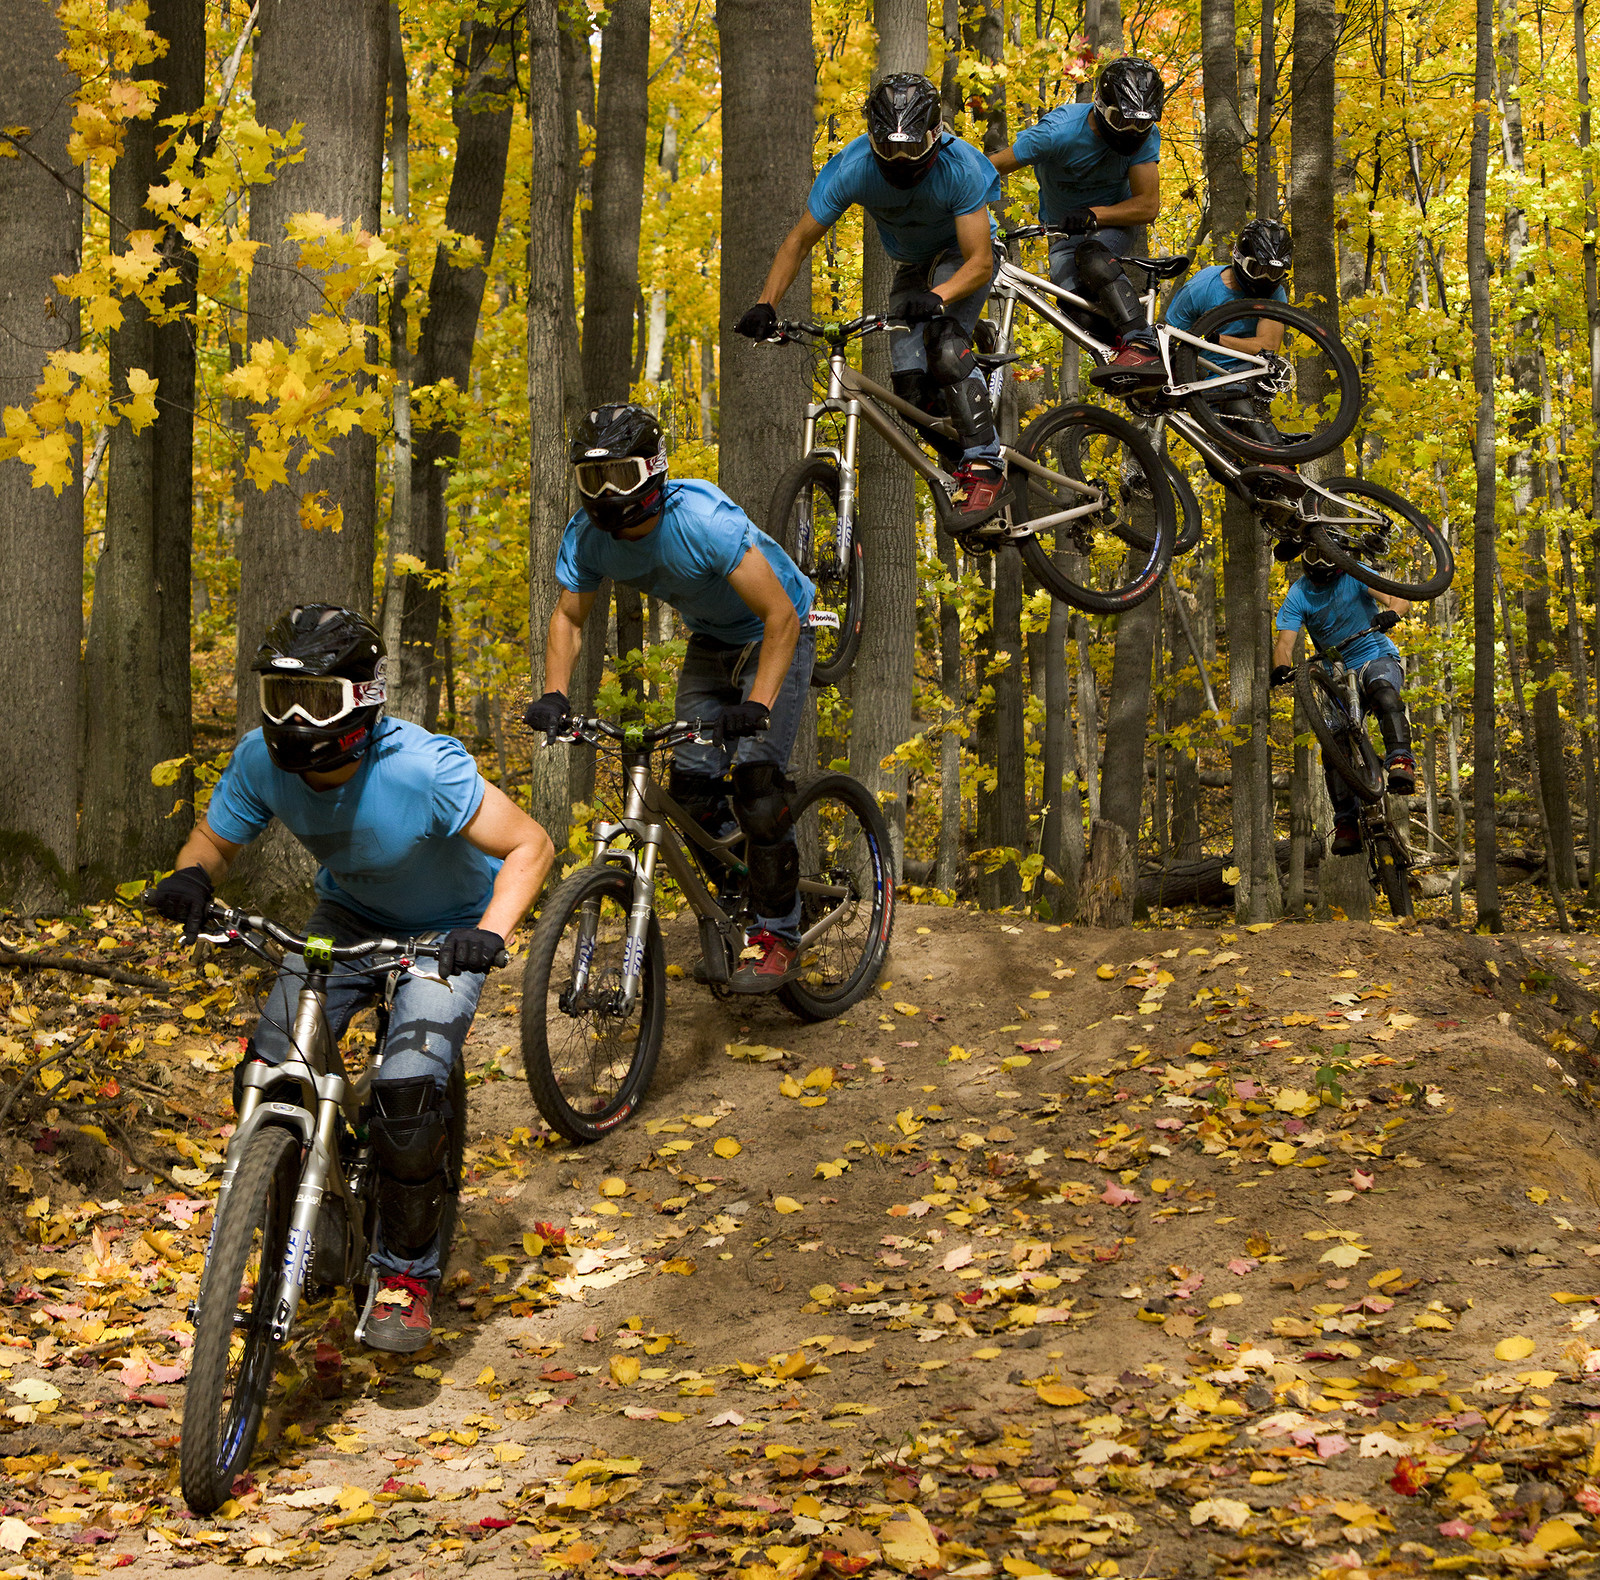 Sick Nasty - mcortrig - Mountain Biking Pictures - Vital MTB